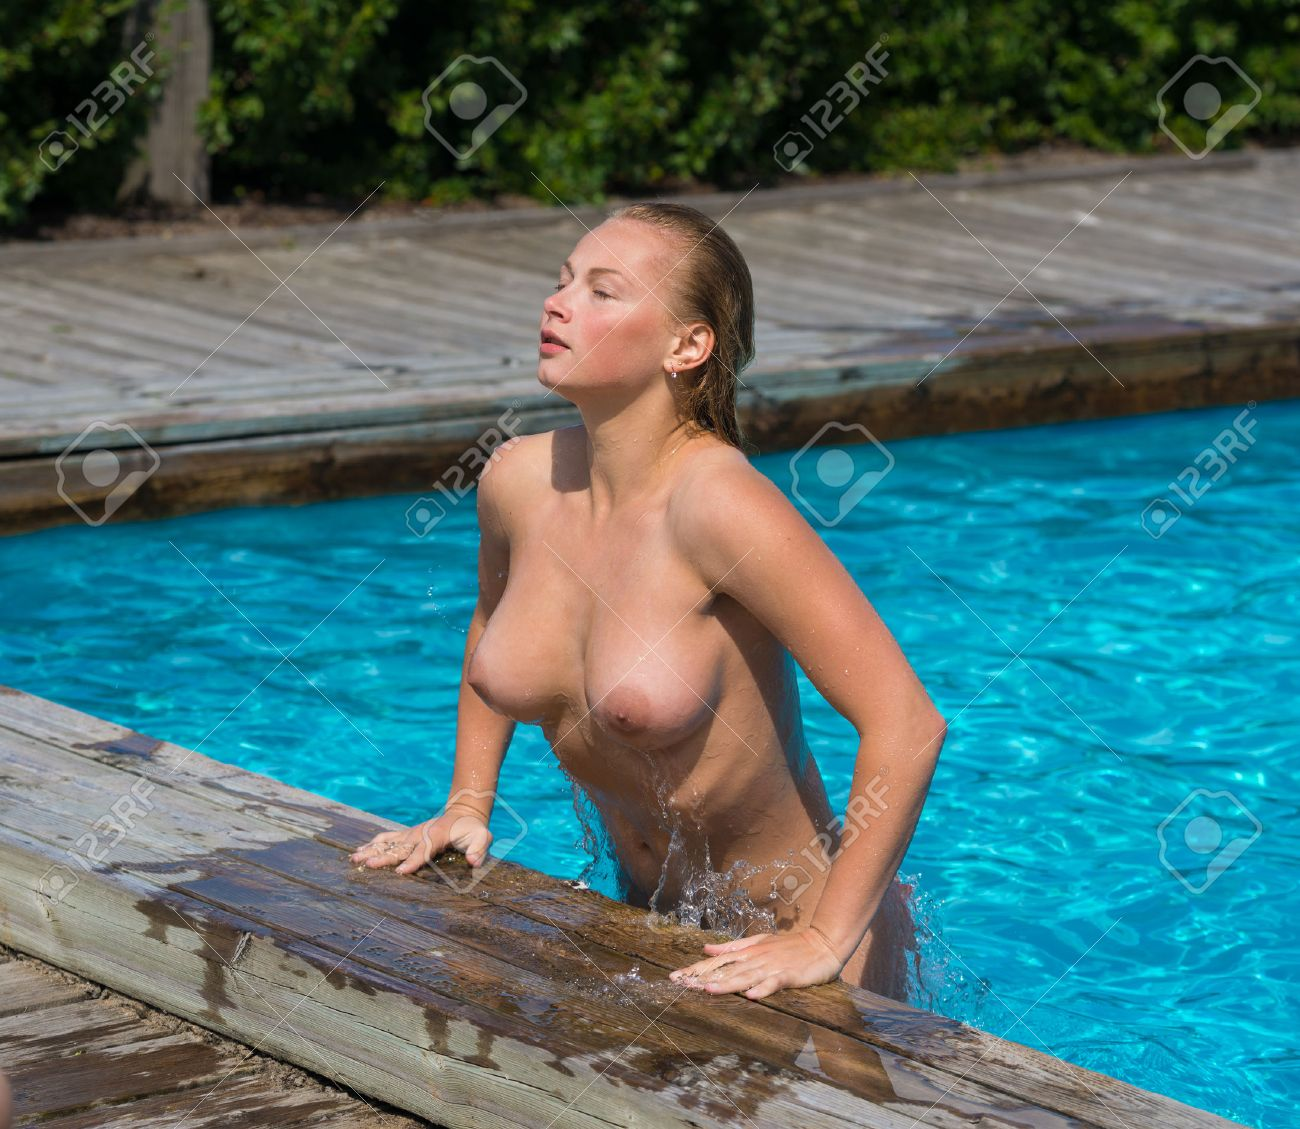 Im schwimmbad nackt frau Nackte Frau